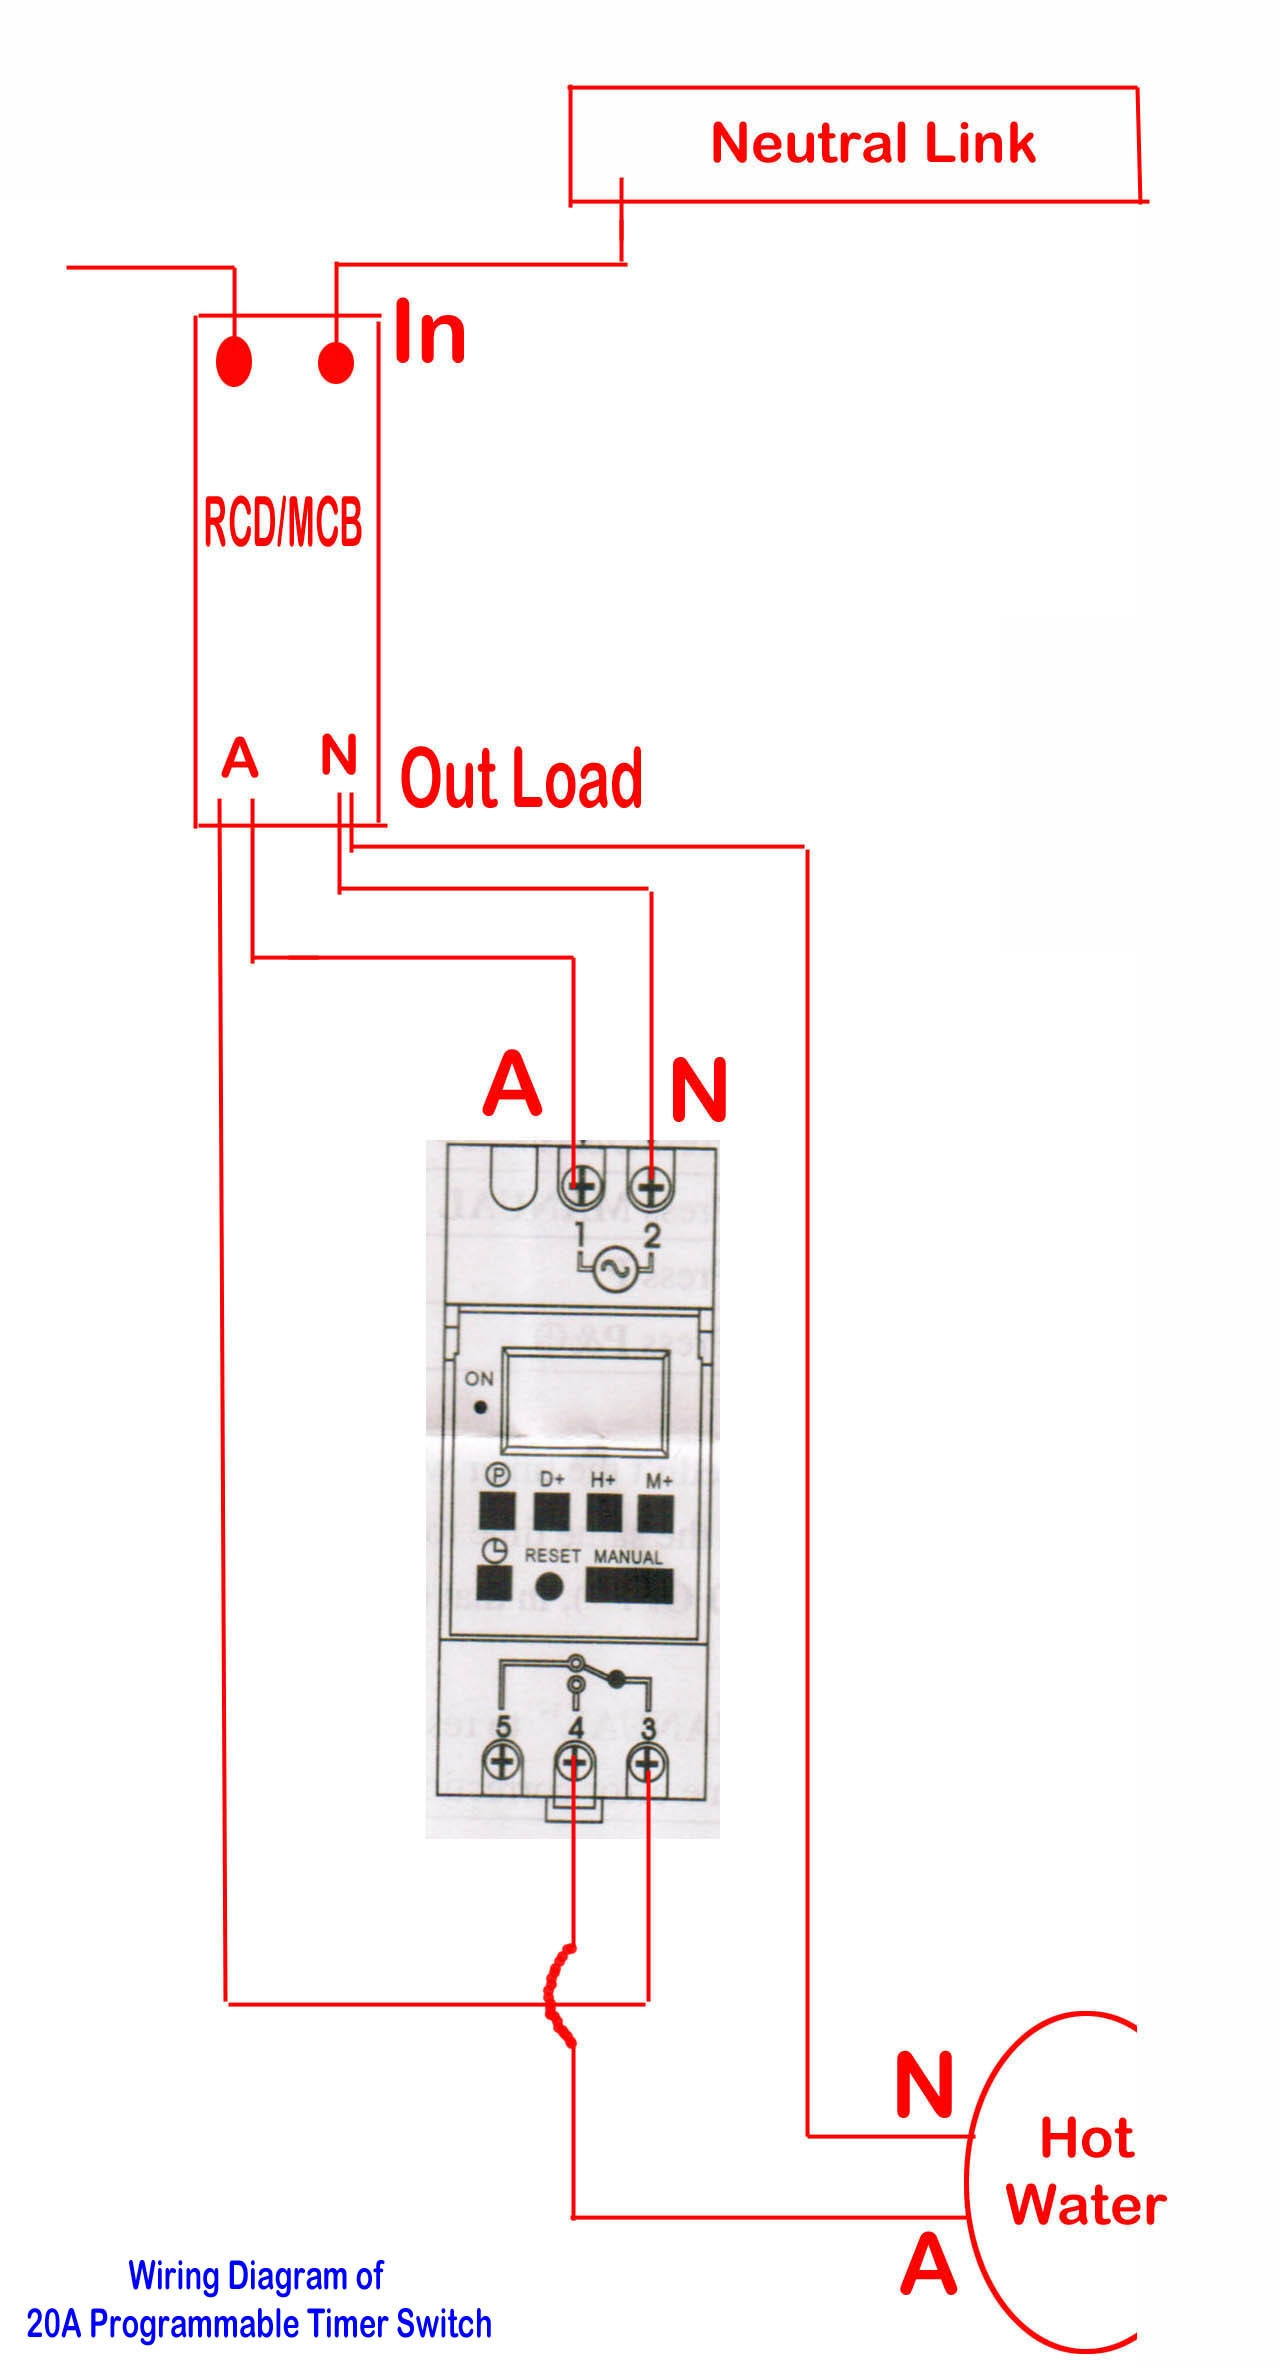 [SCHEMATICS_48IS]  YX_5002] Samsung Dv48H7400Ew A2 Wiring Diagram Wiring Diagram | A2 Wiring Diagram |  | Jidig Tobiq Bupi Bletu Ndine Remca Trofu Funi Sarc Exxlu Umng  Mohammedshrine Librar Wiring 101